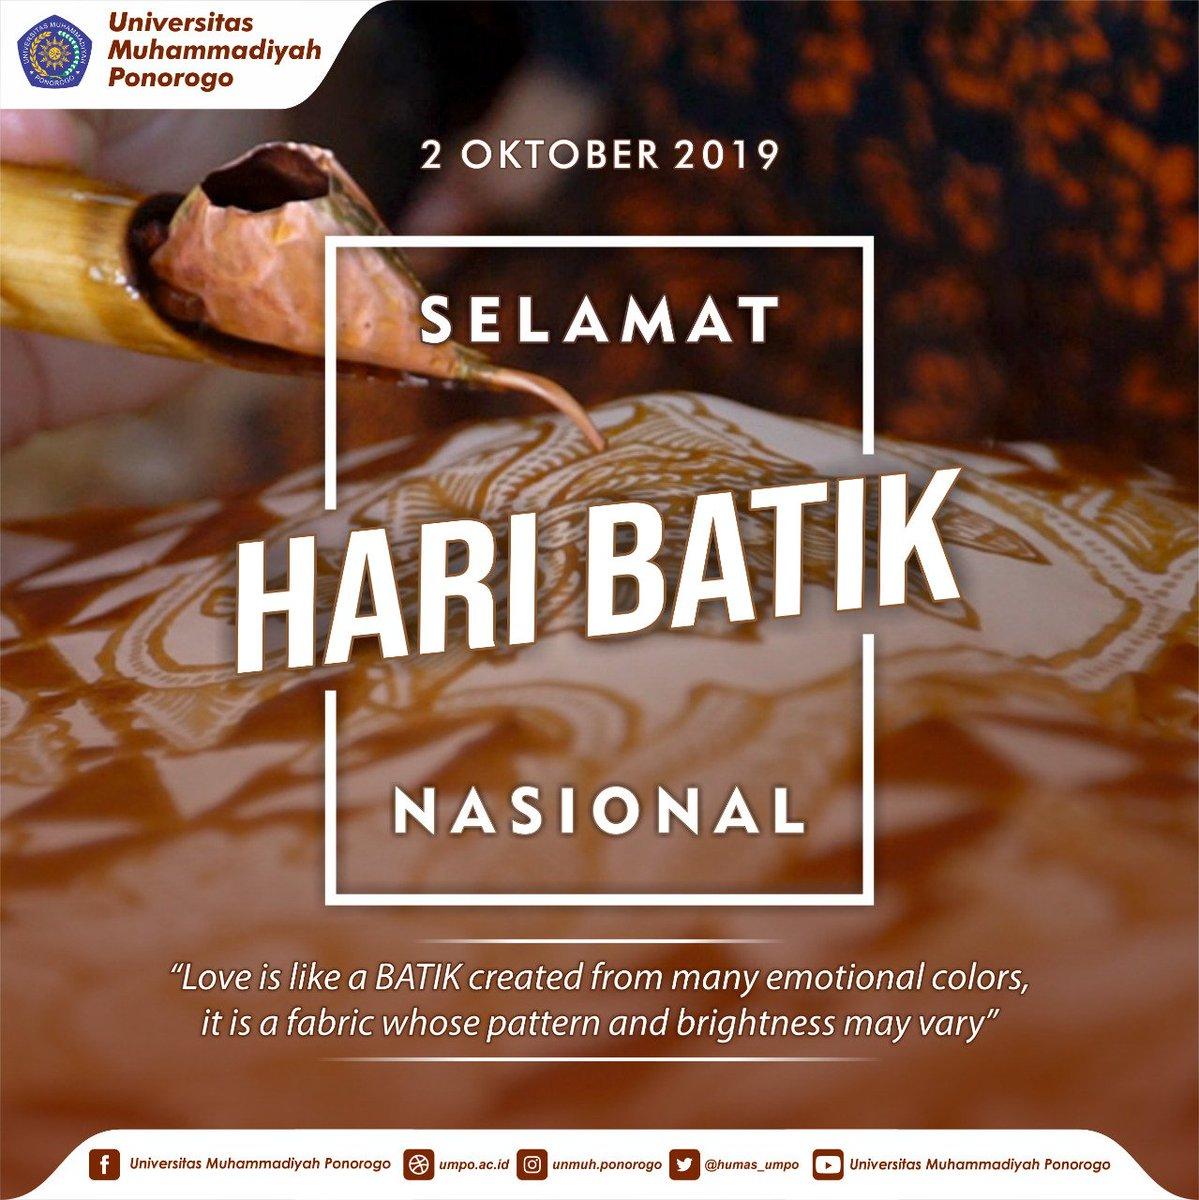 Univ Muhammadiyah Ponorogo On Twitter Love Is Like Batik